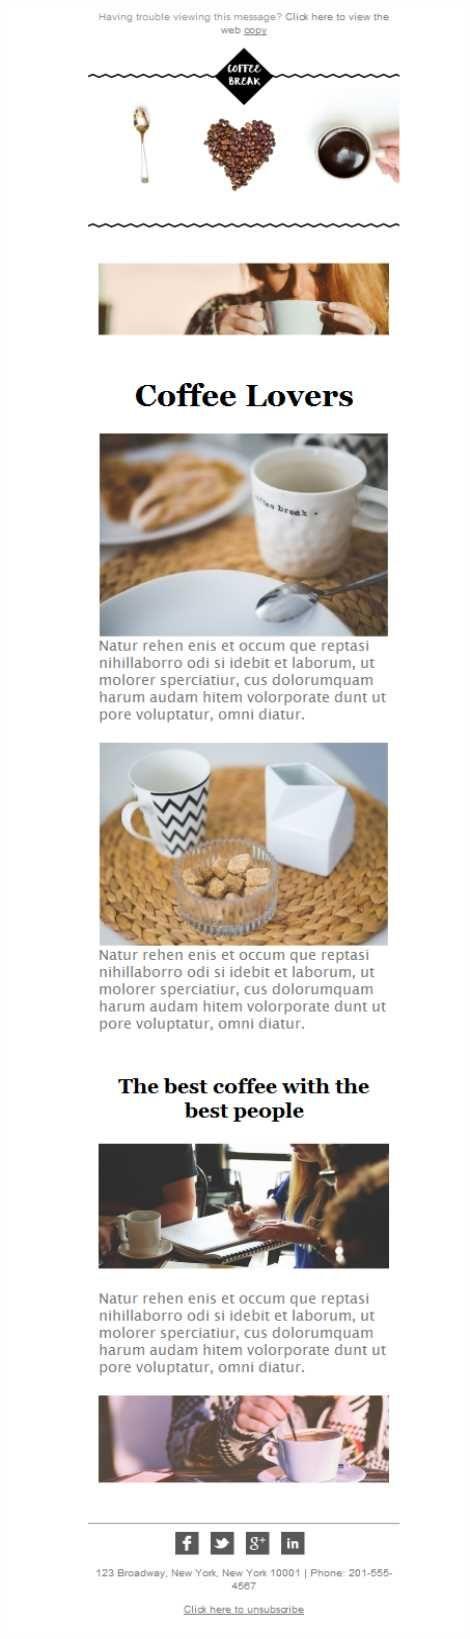 Amantes del café, aquí tenéis vuestra plantilla de newsletter responsive diseñada por Mailify. ¡Impecable!